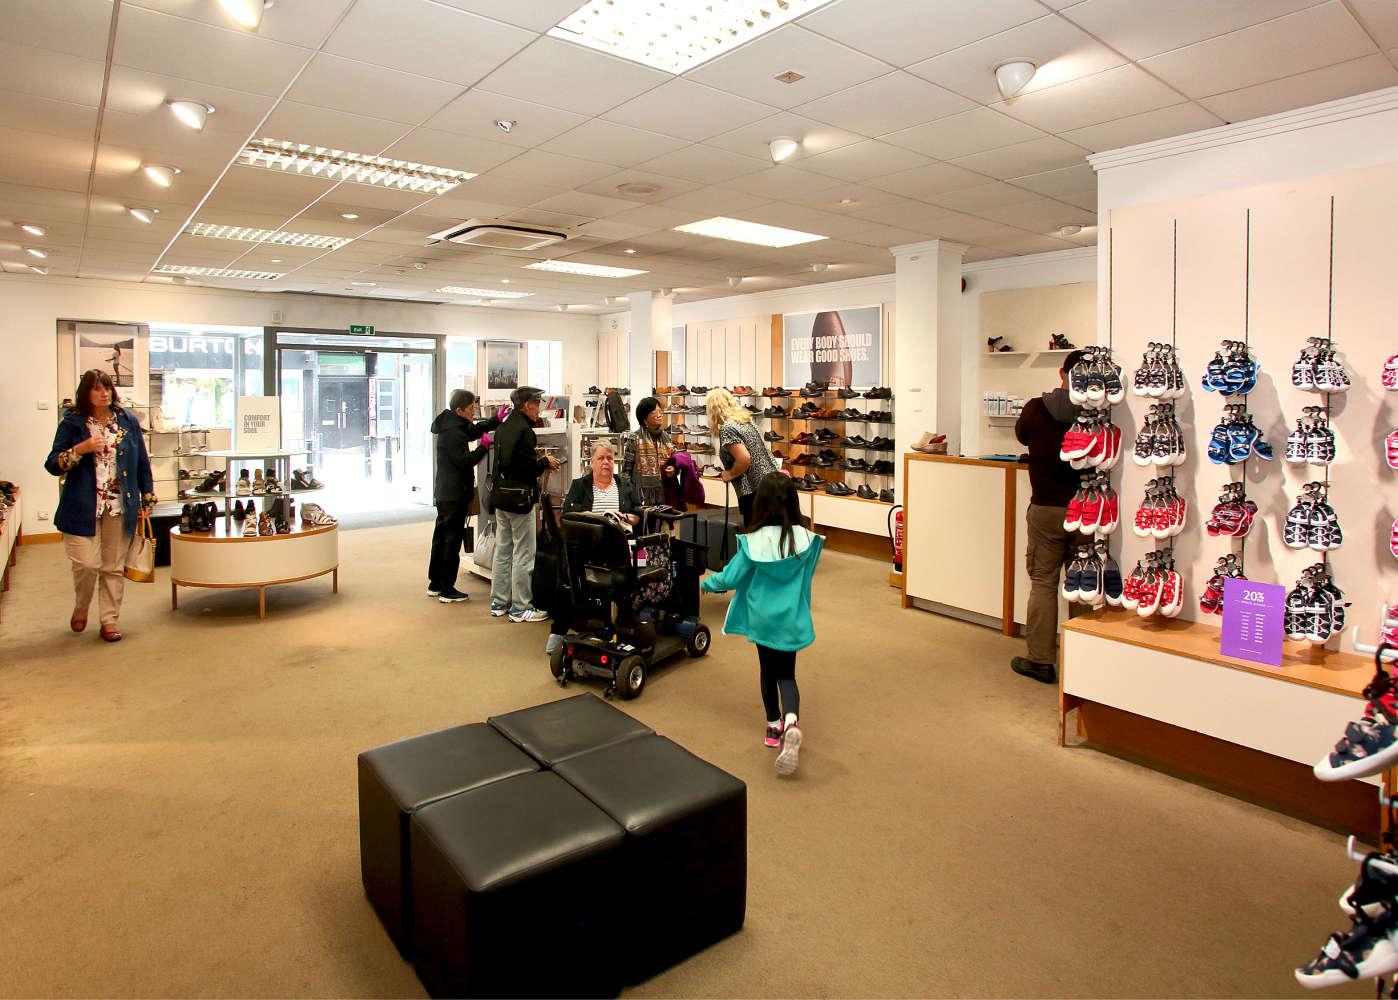 Retail high street Inverness, IV1 1JE - 40-42, High Street - 0061